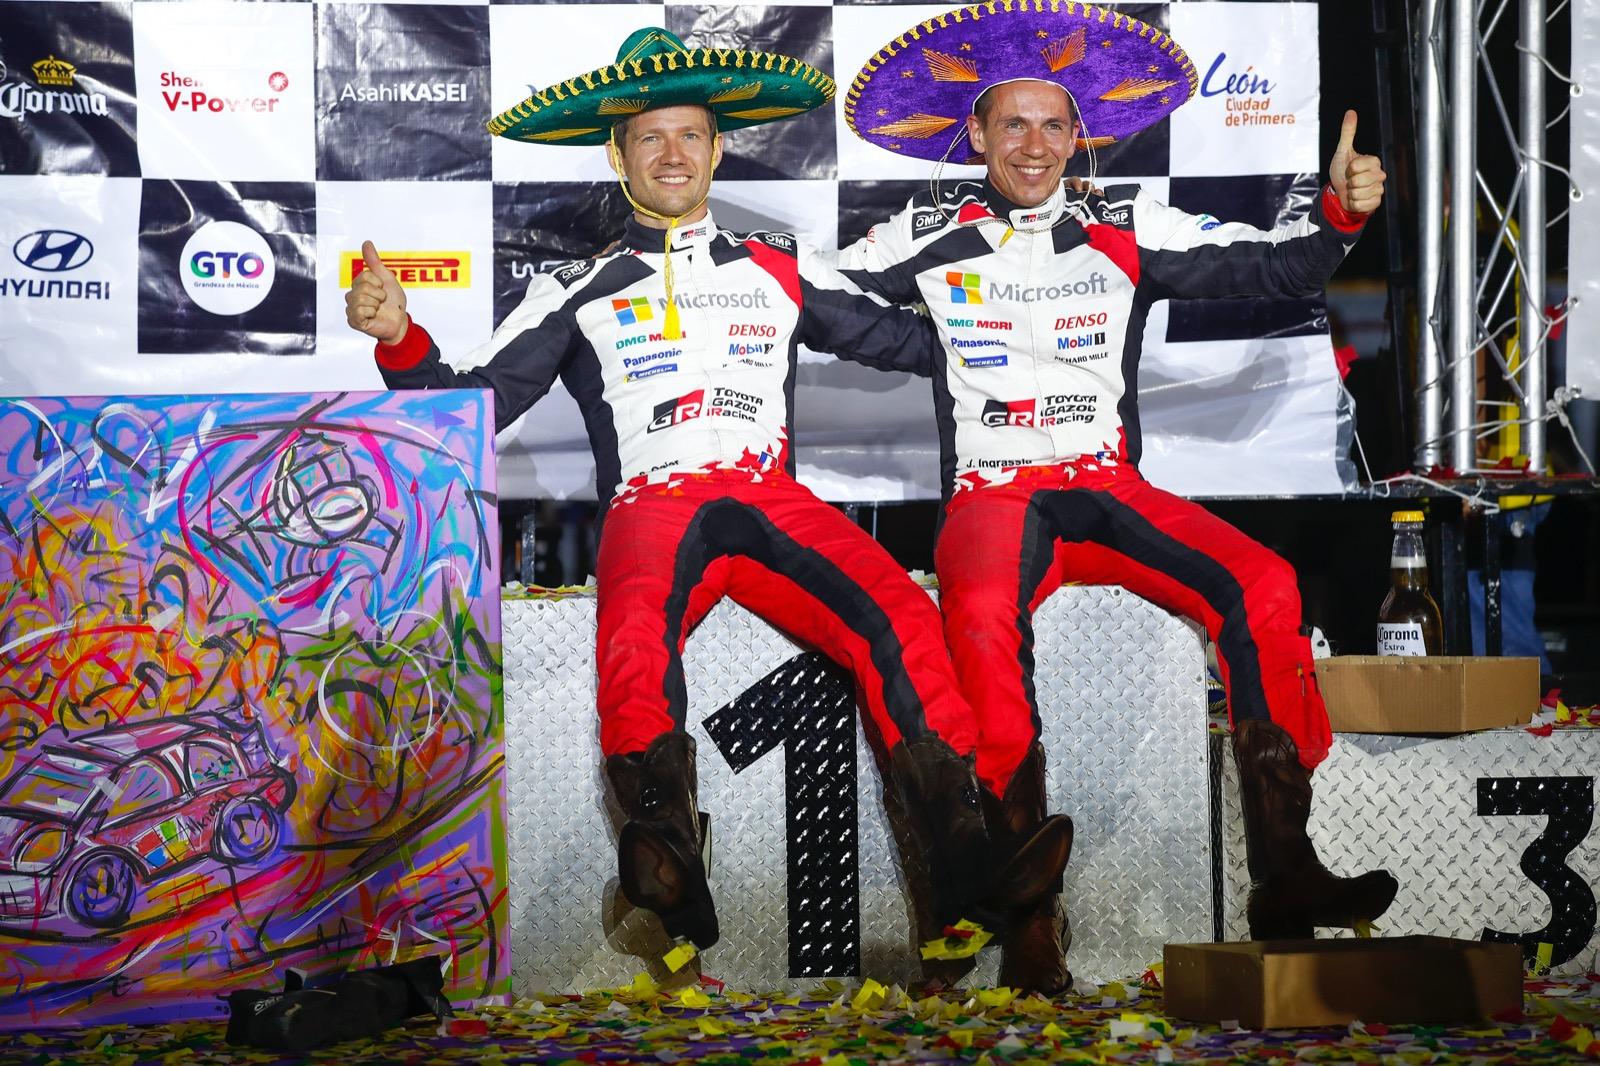 WRC: 17º Rallye Guanajuato Corona - México [12-15 Marzo] - Página 7 ETH5AGJWAAEaDZ_?format=jpg&name=large